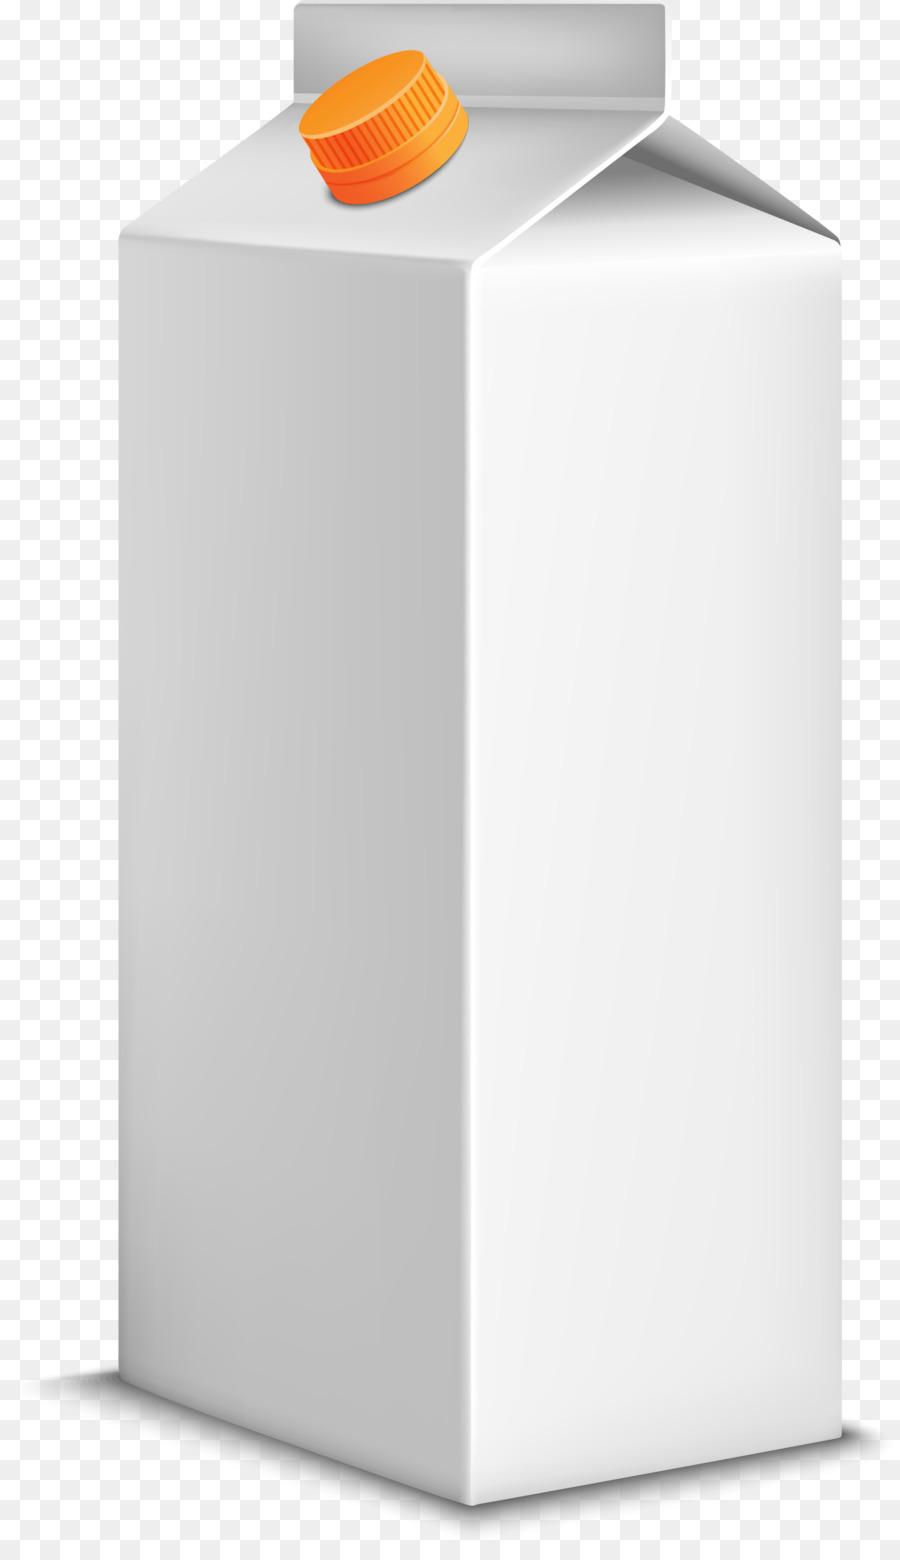 900x1560 Juice Vecteur Computer File